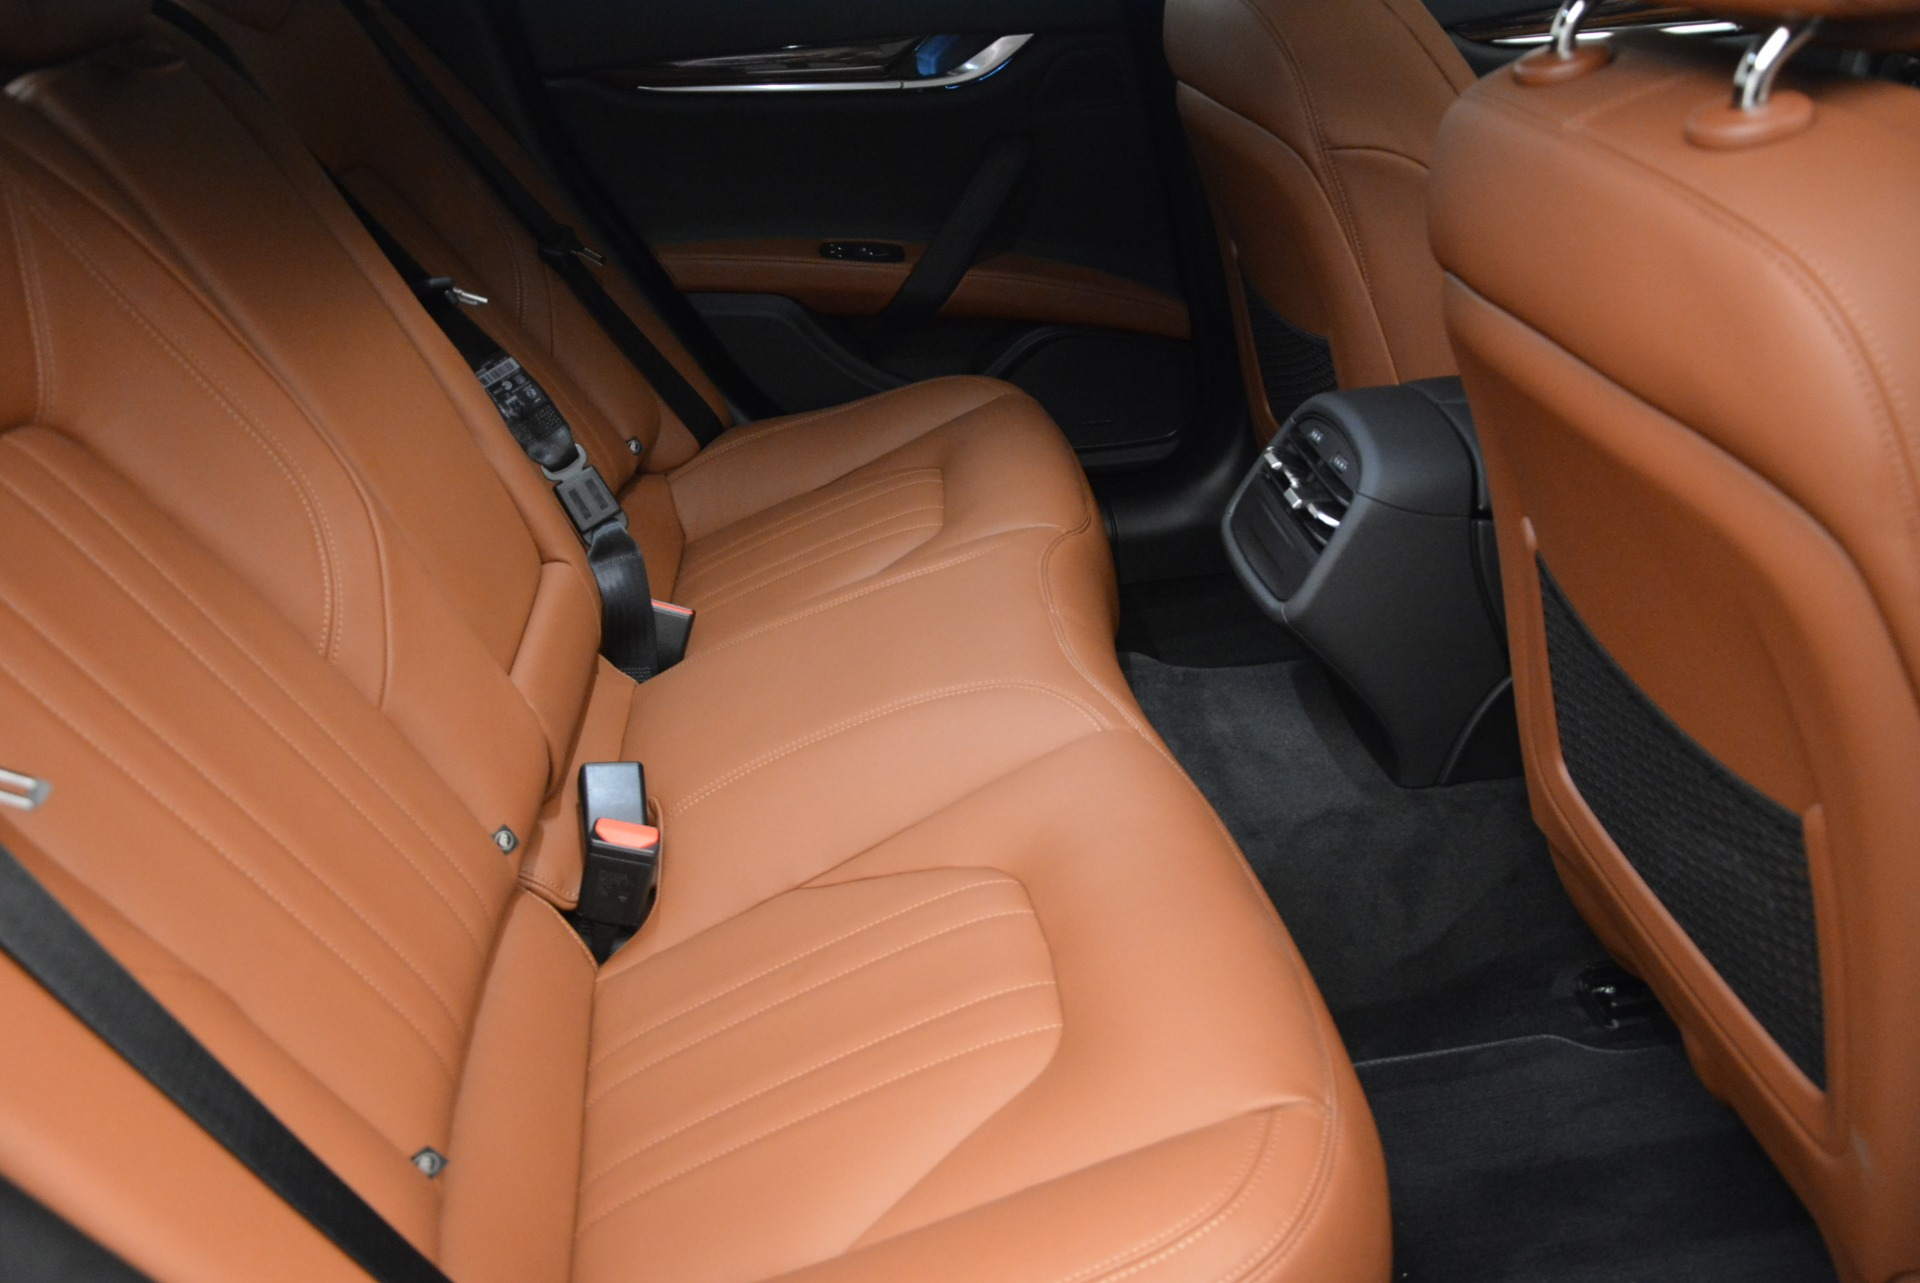 Used 2017 Maserati Ghibli S Q4 EX-LOANER For Sale In Westport, CT 608_p24